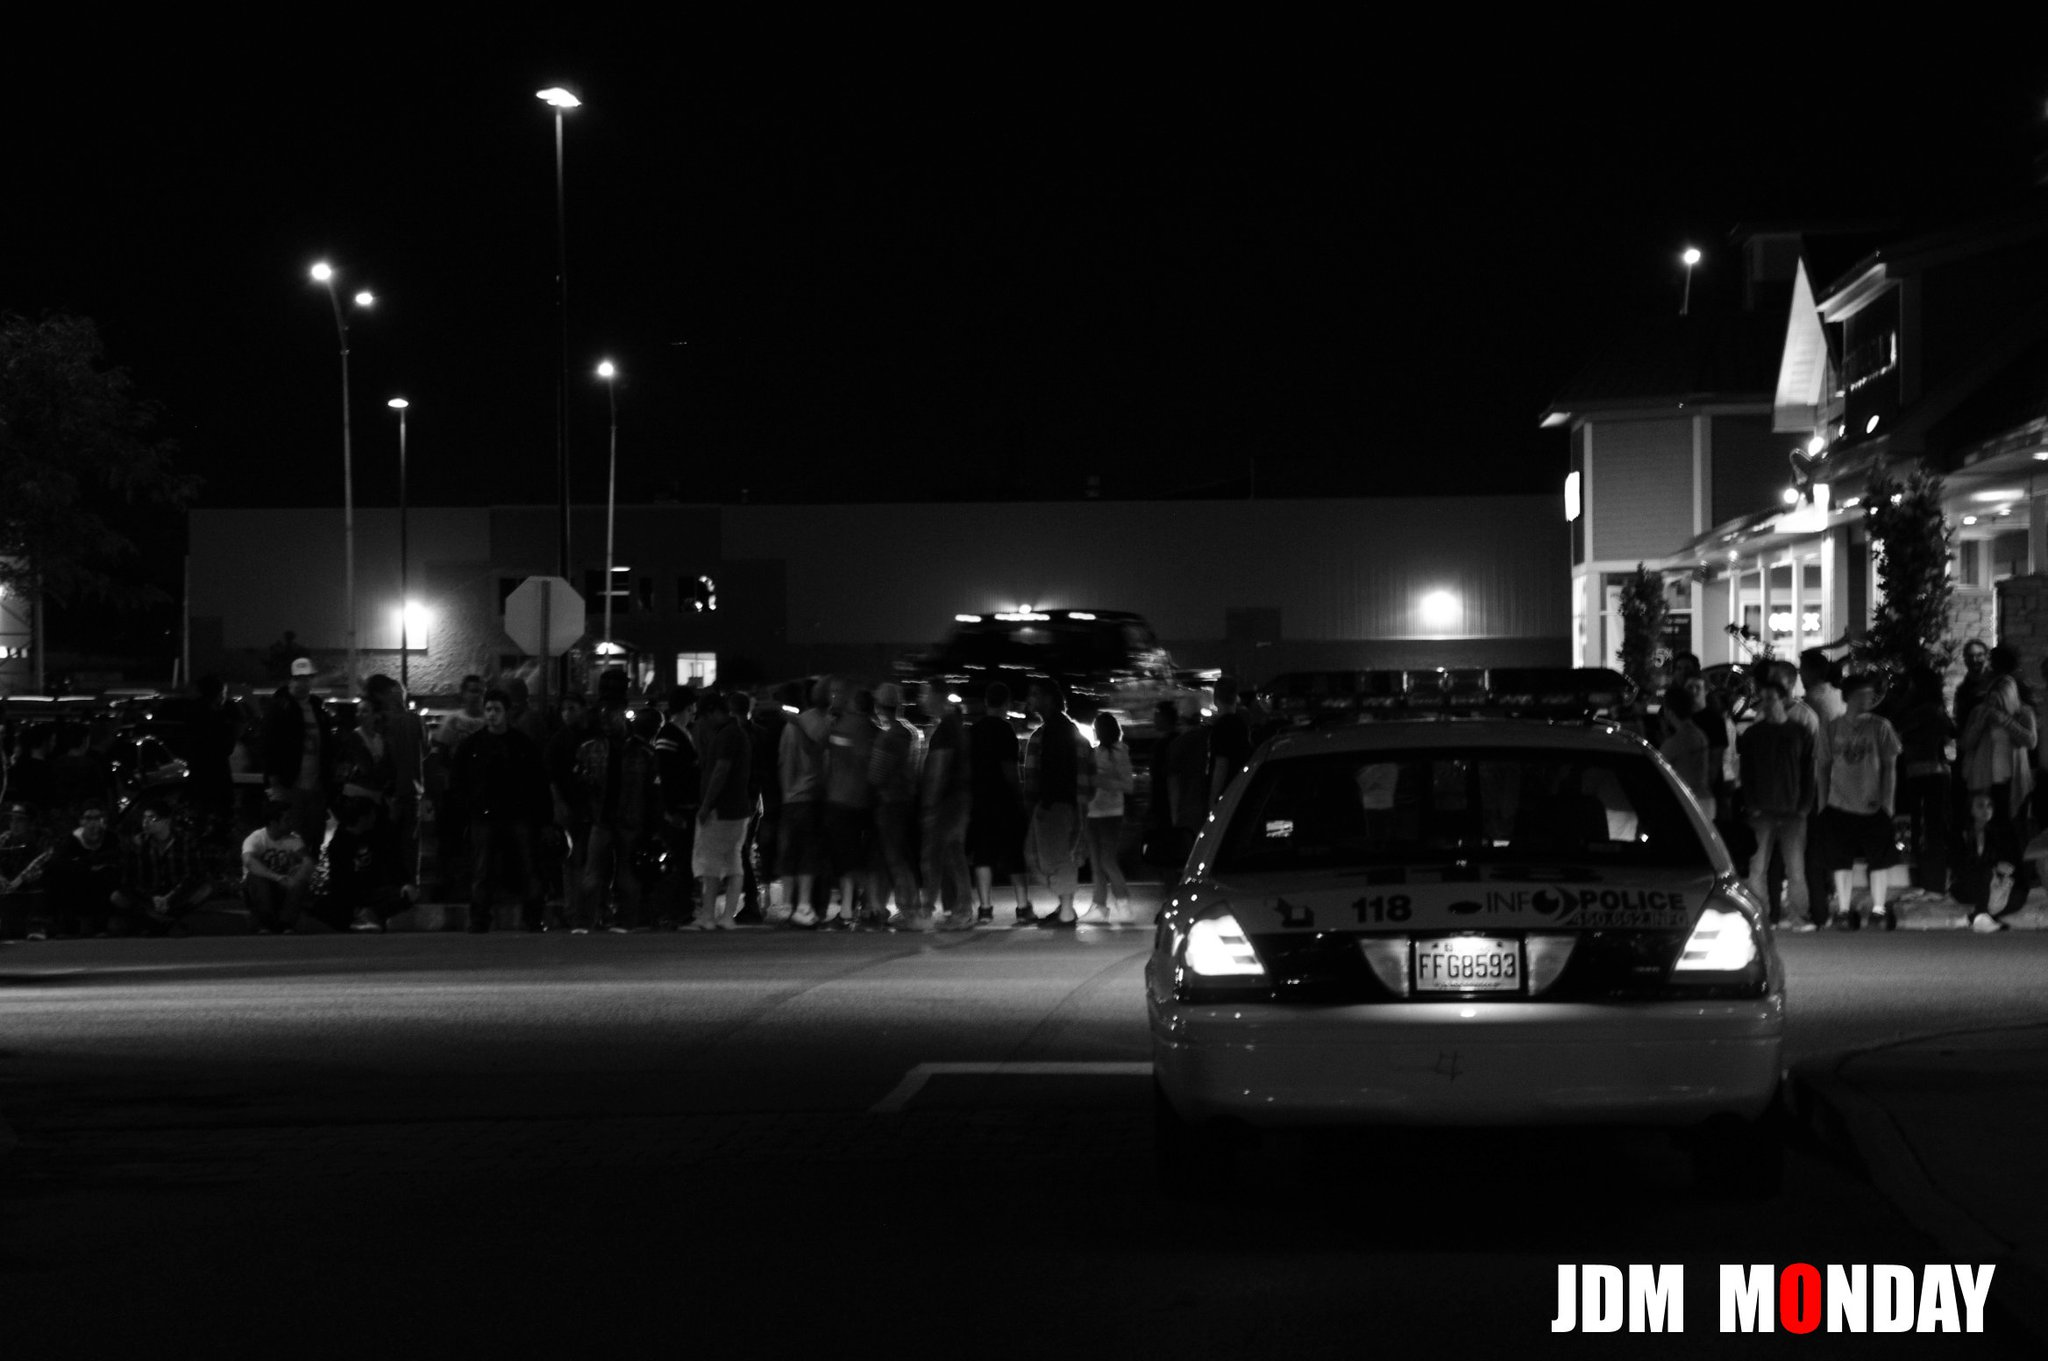 """JDM Monday"" Laval"